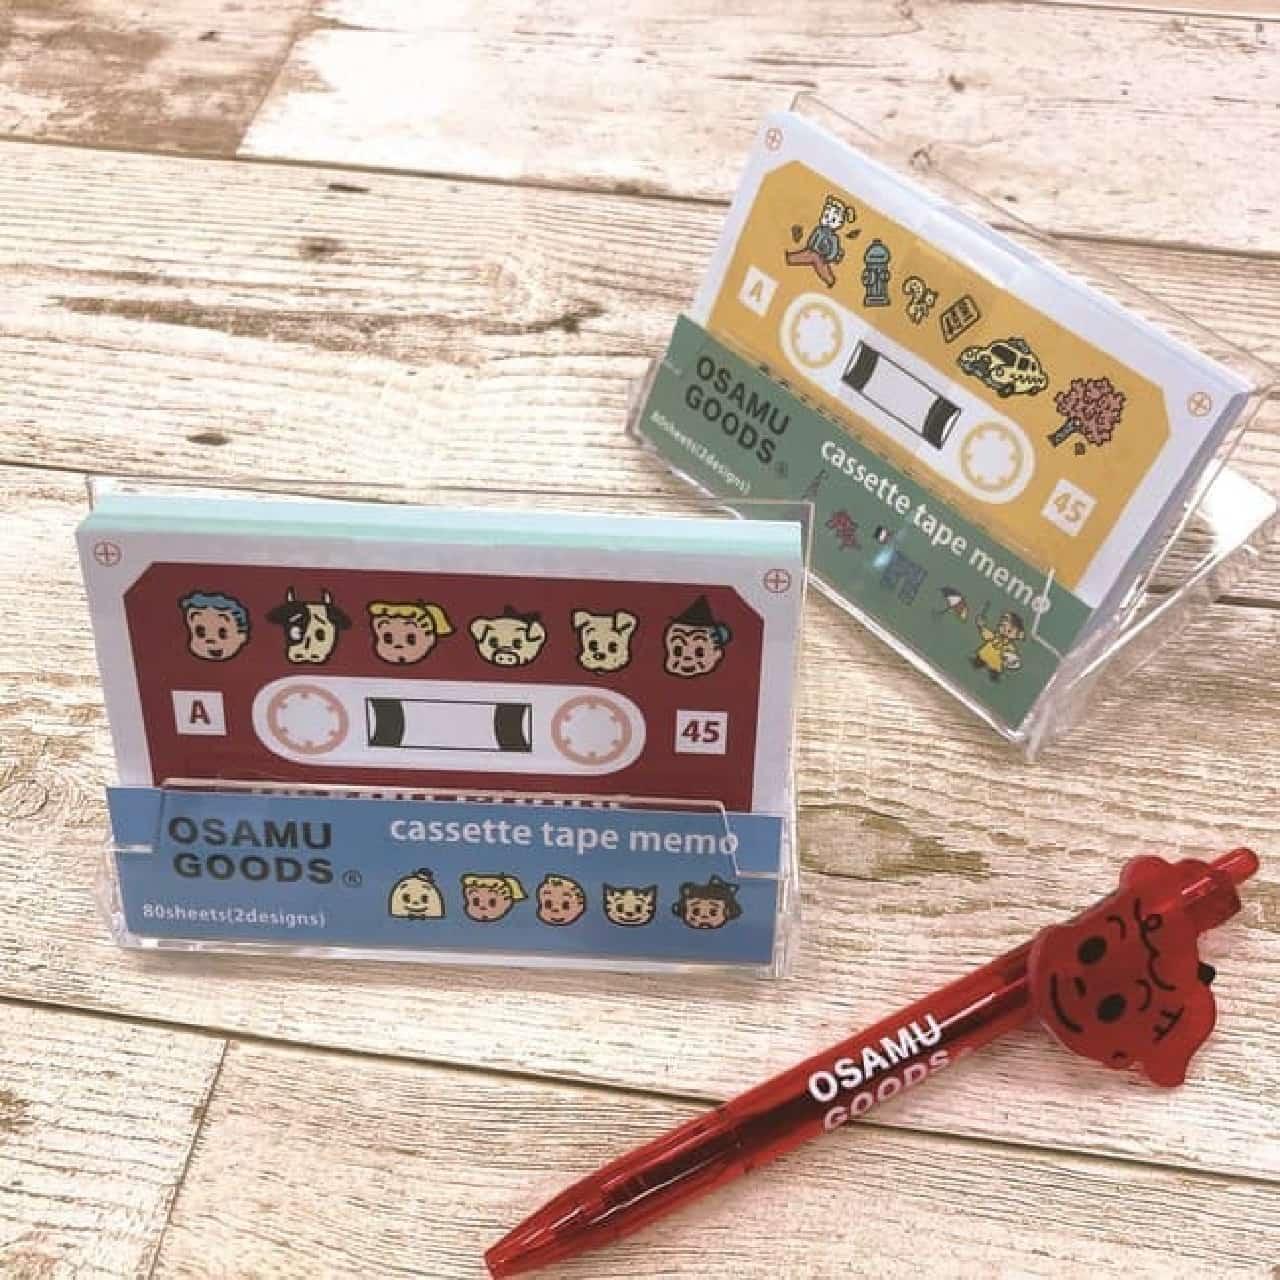 「OSAMU GOODS(オサムグッズ)」ステーショナリー第3弾 -- レトロなカセットテープ風メモも